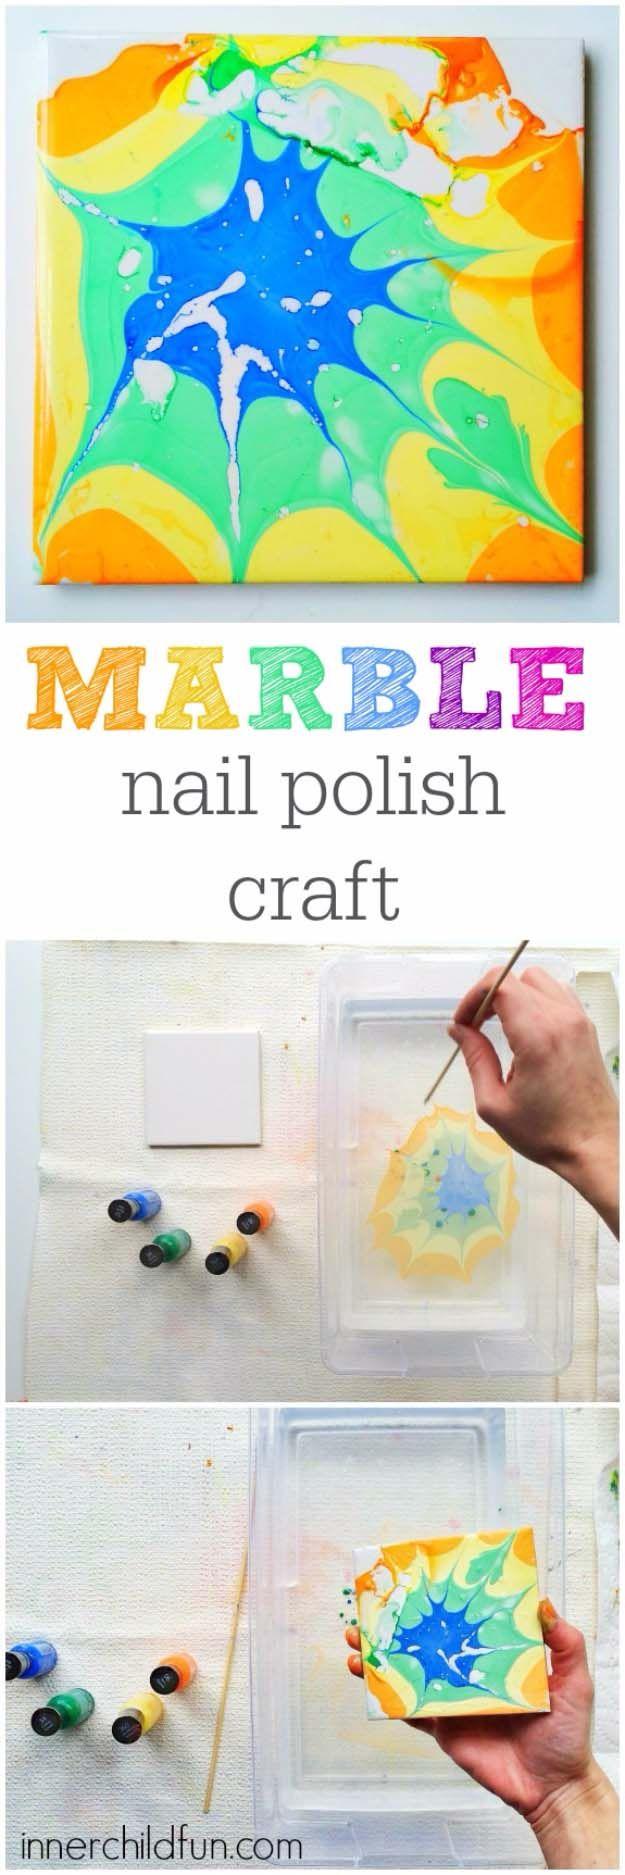 Birthday craft ideas for girls - 31 Incredibly Cool Diy Crafts Using Nail Polish